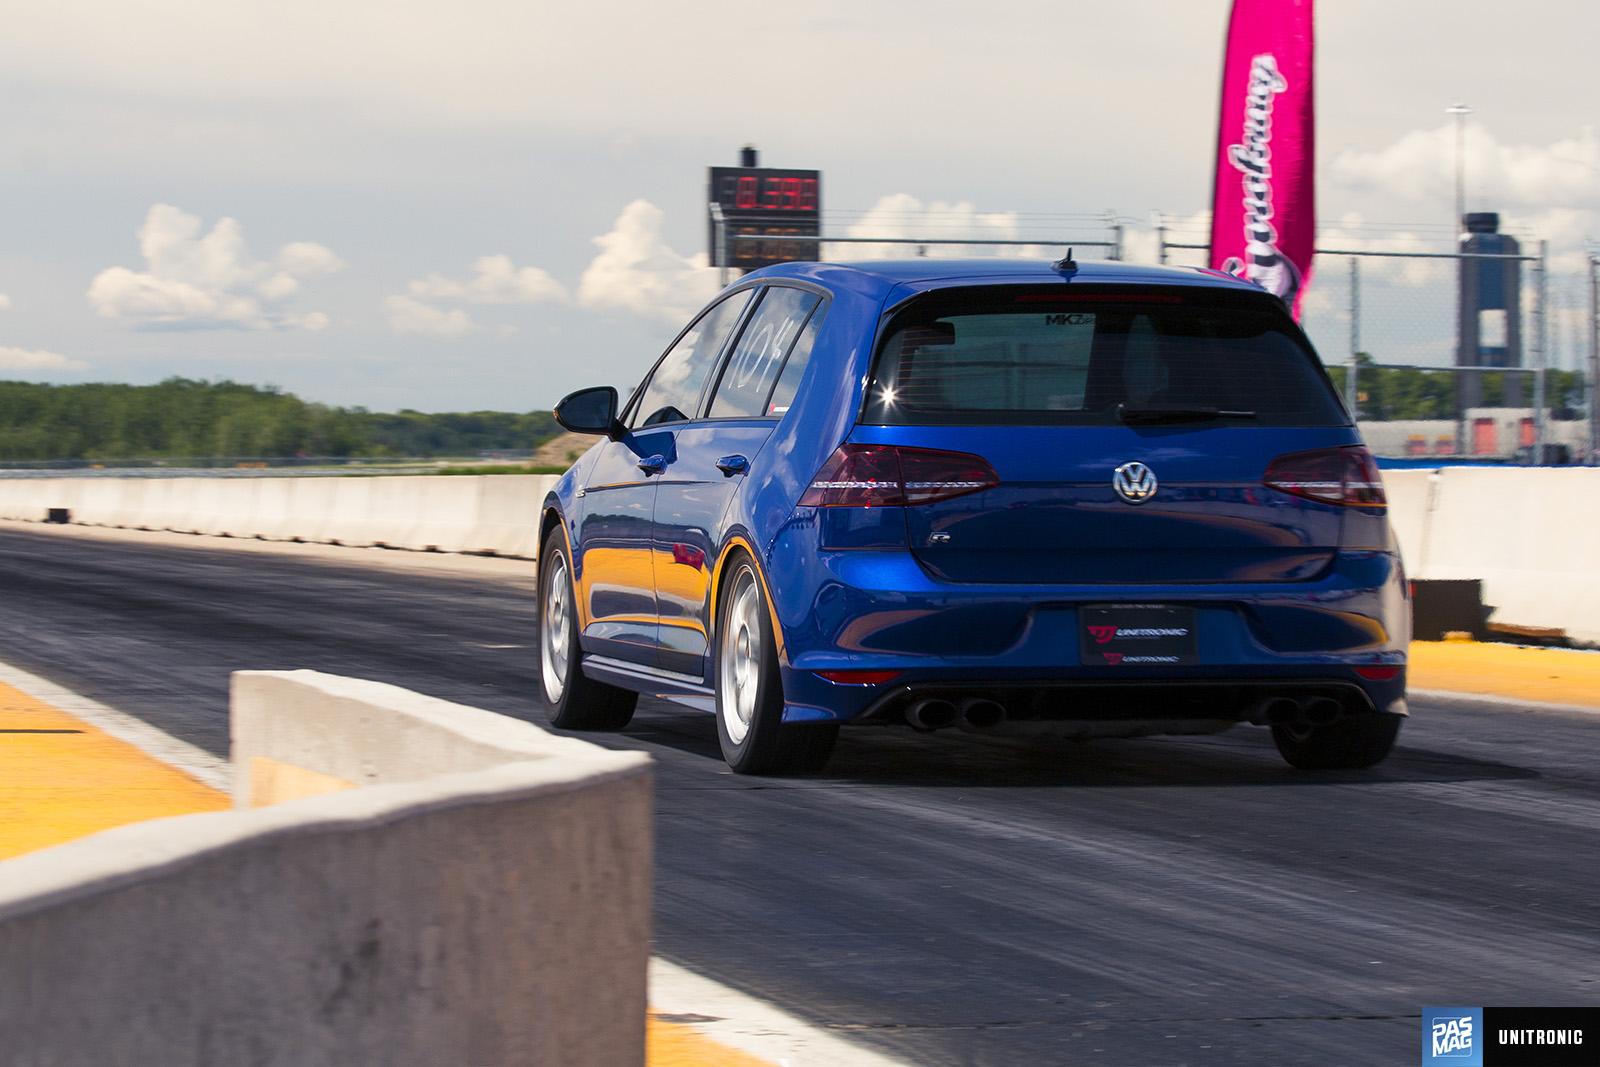 PASMAG | PERFORMANCE AUTO AND SOUND - Race Mode: Unitronic's